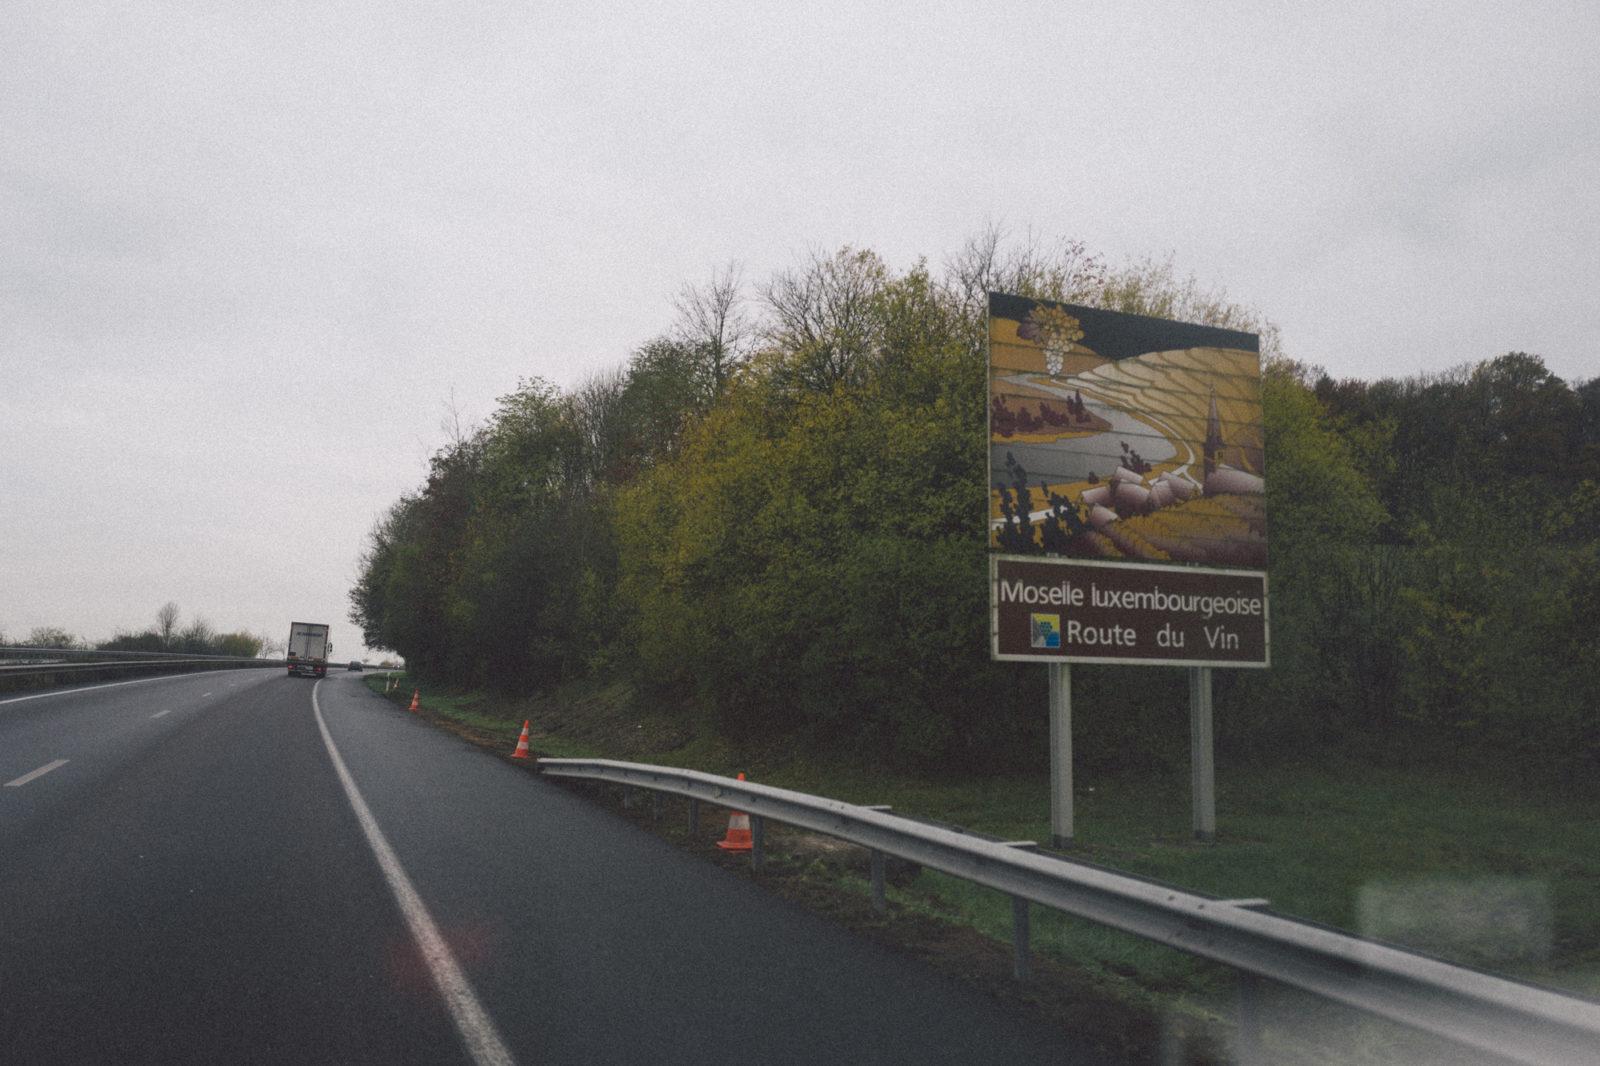 Reise-1060376